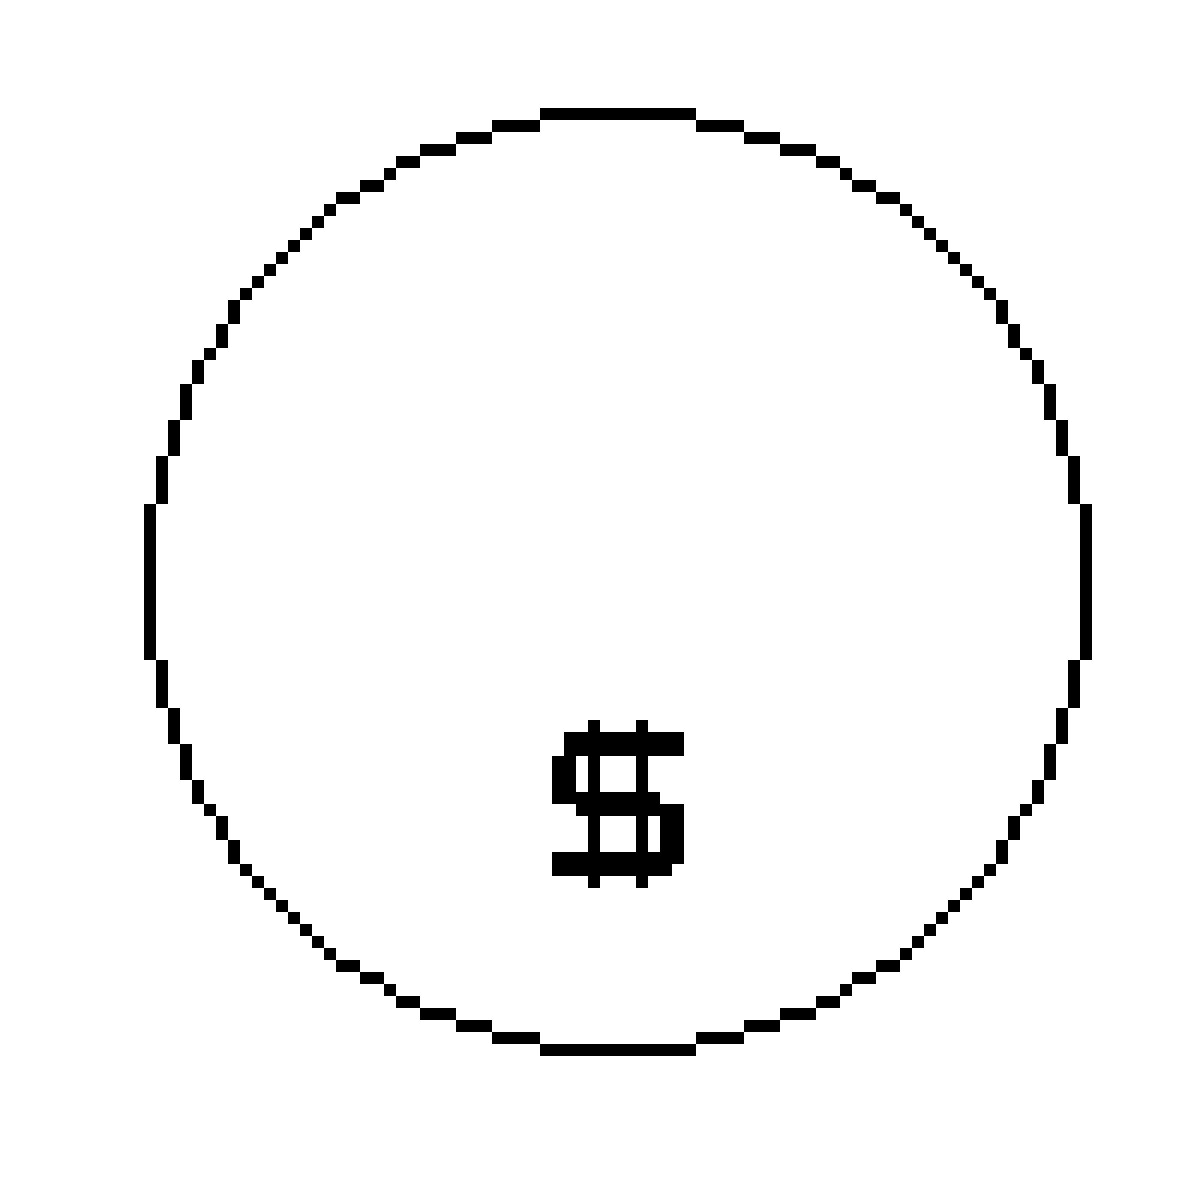 Capitalism (undone) by Capi